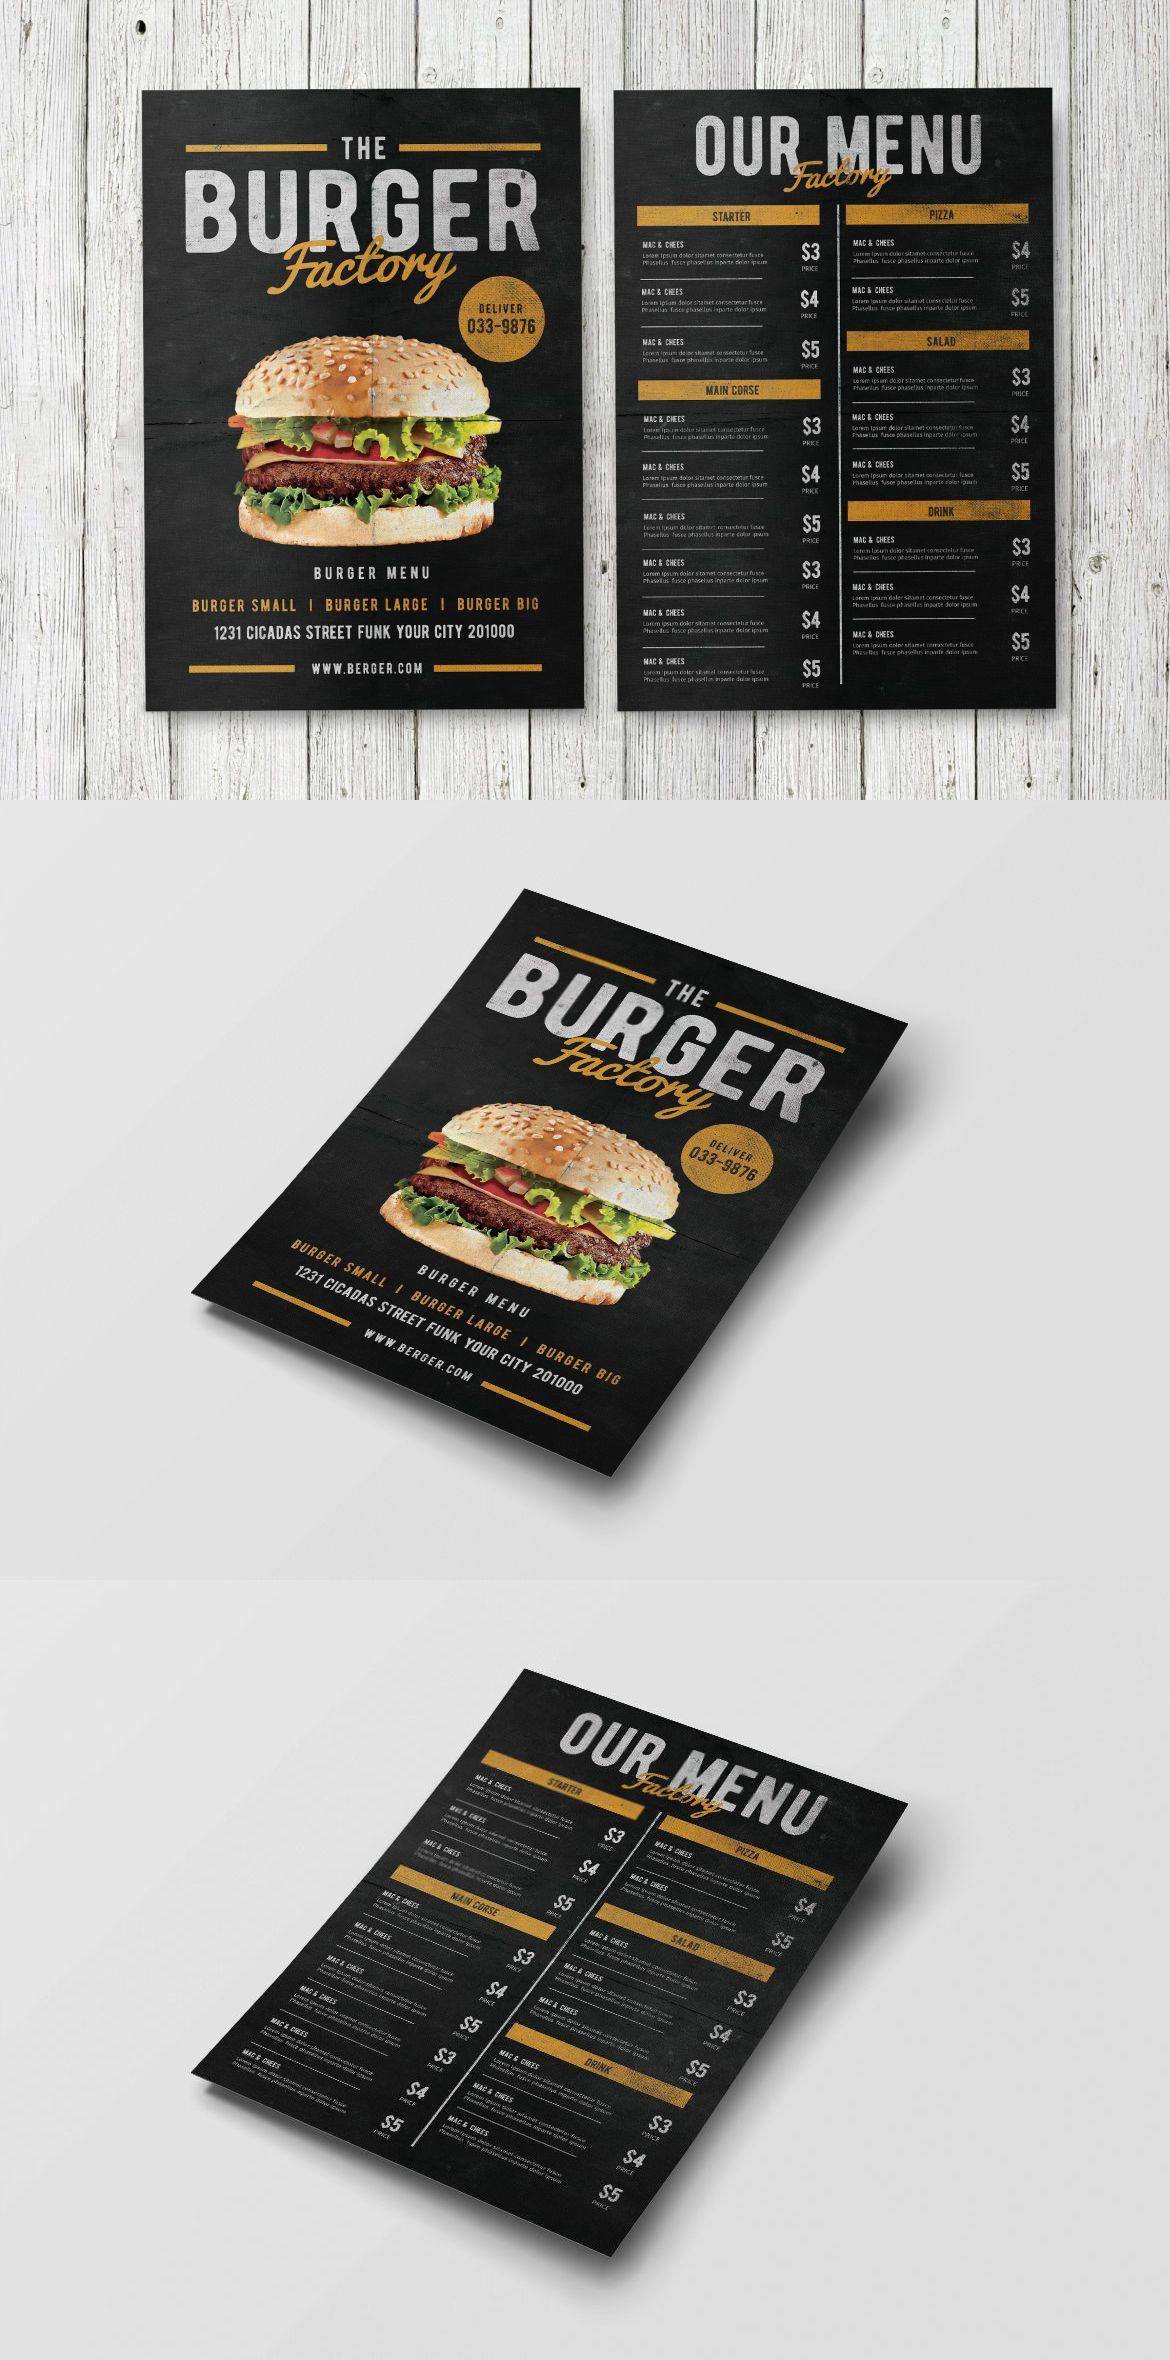 Burger Factory Menu Template PSD Foodmenu Design Burger - Small menu template